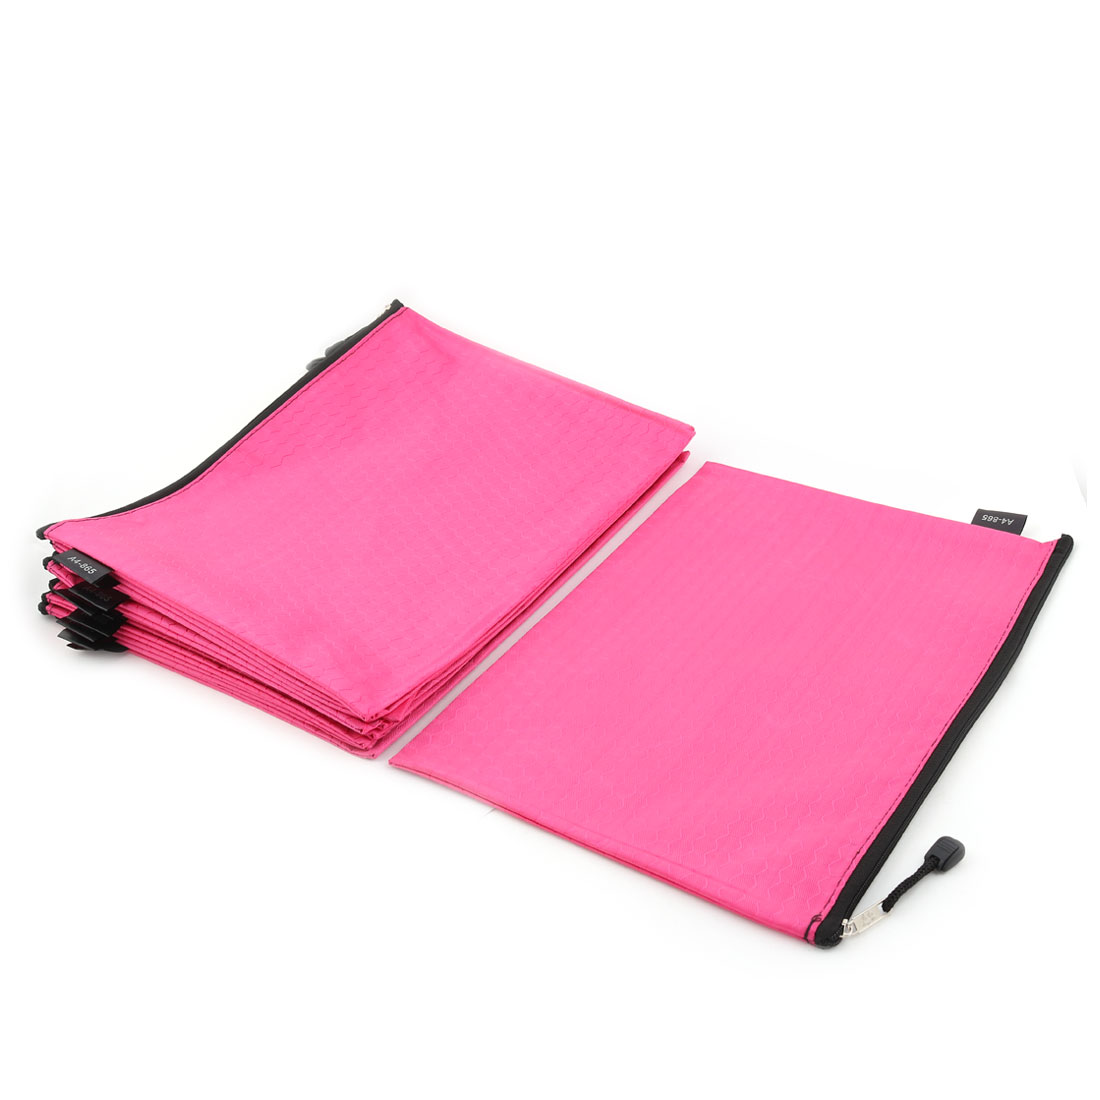 Office School Nylon Grid Pattern Zippered A4 Size Paper Document File Storage Bag Fuchsia 10pcs